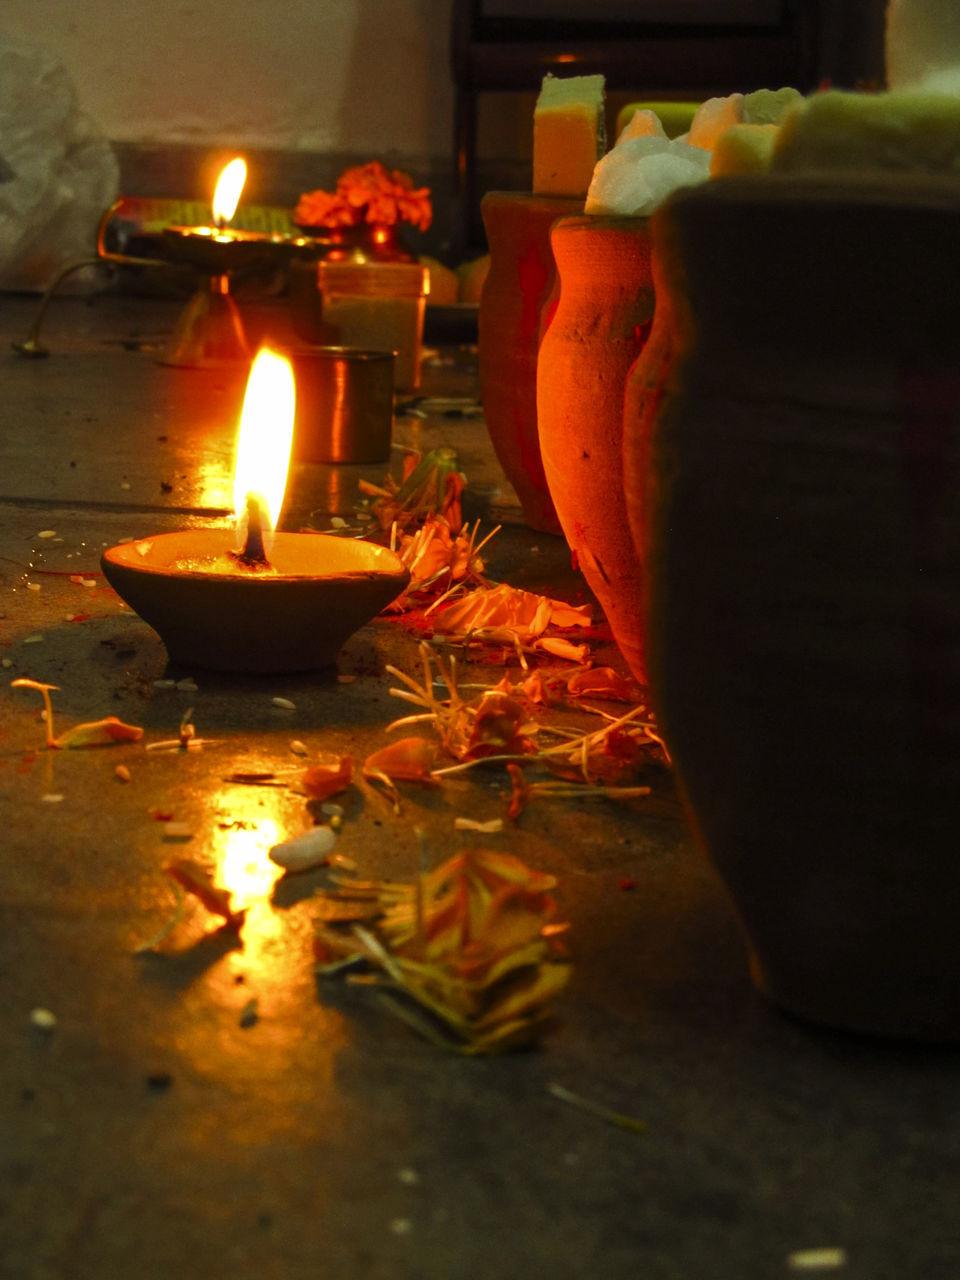 flame, no people, night, selective focus, burning, illuminated, heat - temperature, close-up, celebration, indoors, leaf, diya - oil lamp